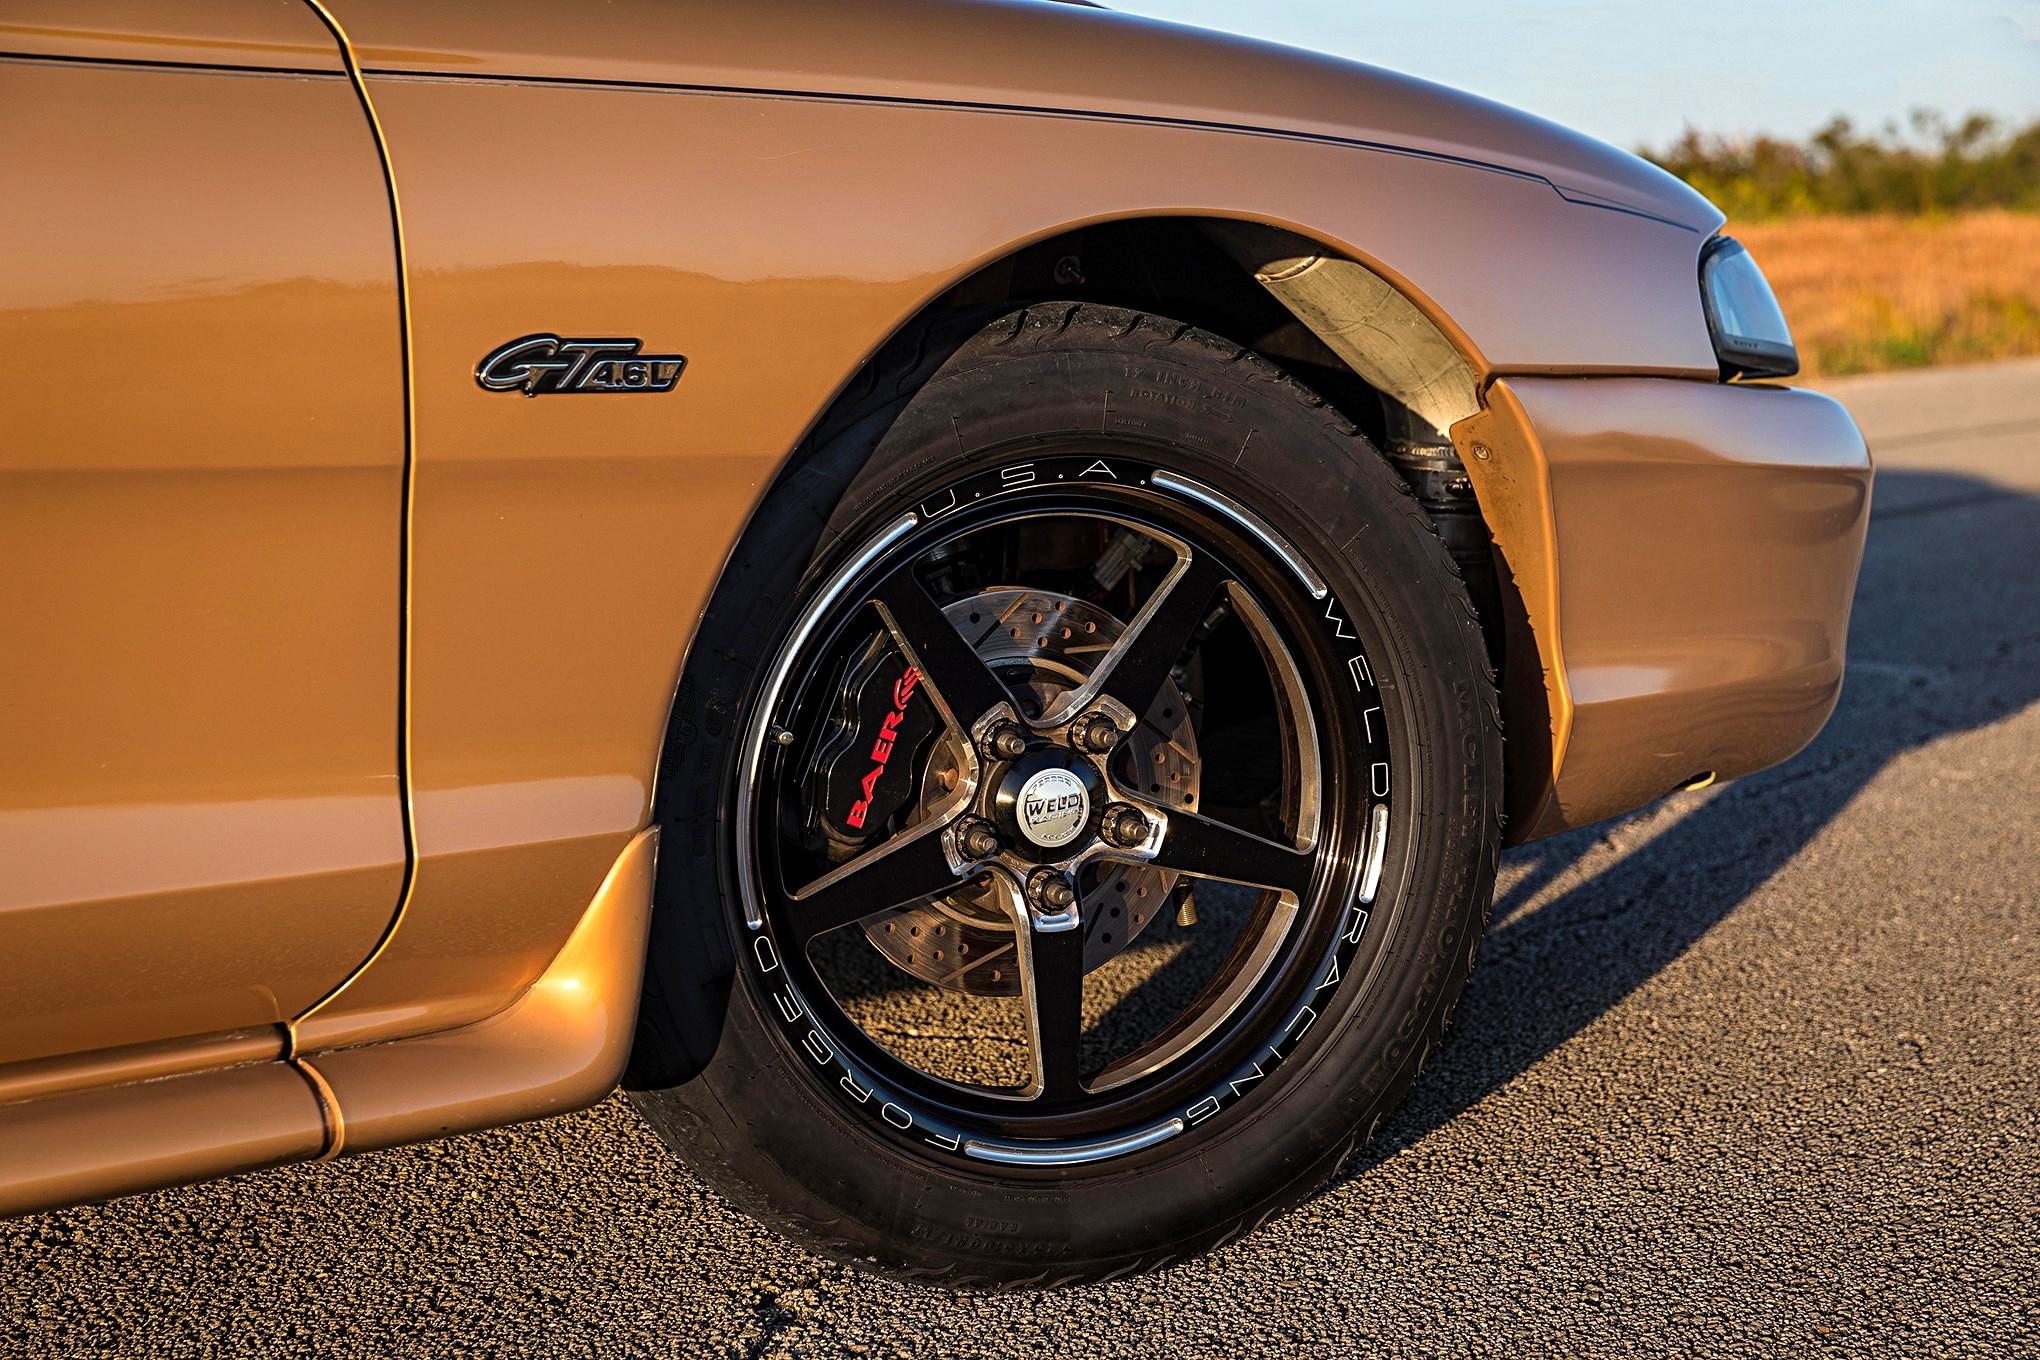 SN95 Kurtis Forsberg 1997 Ford Mustang Gt 008